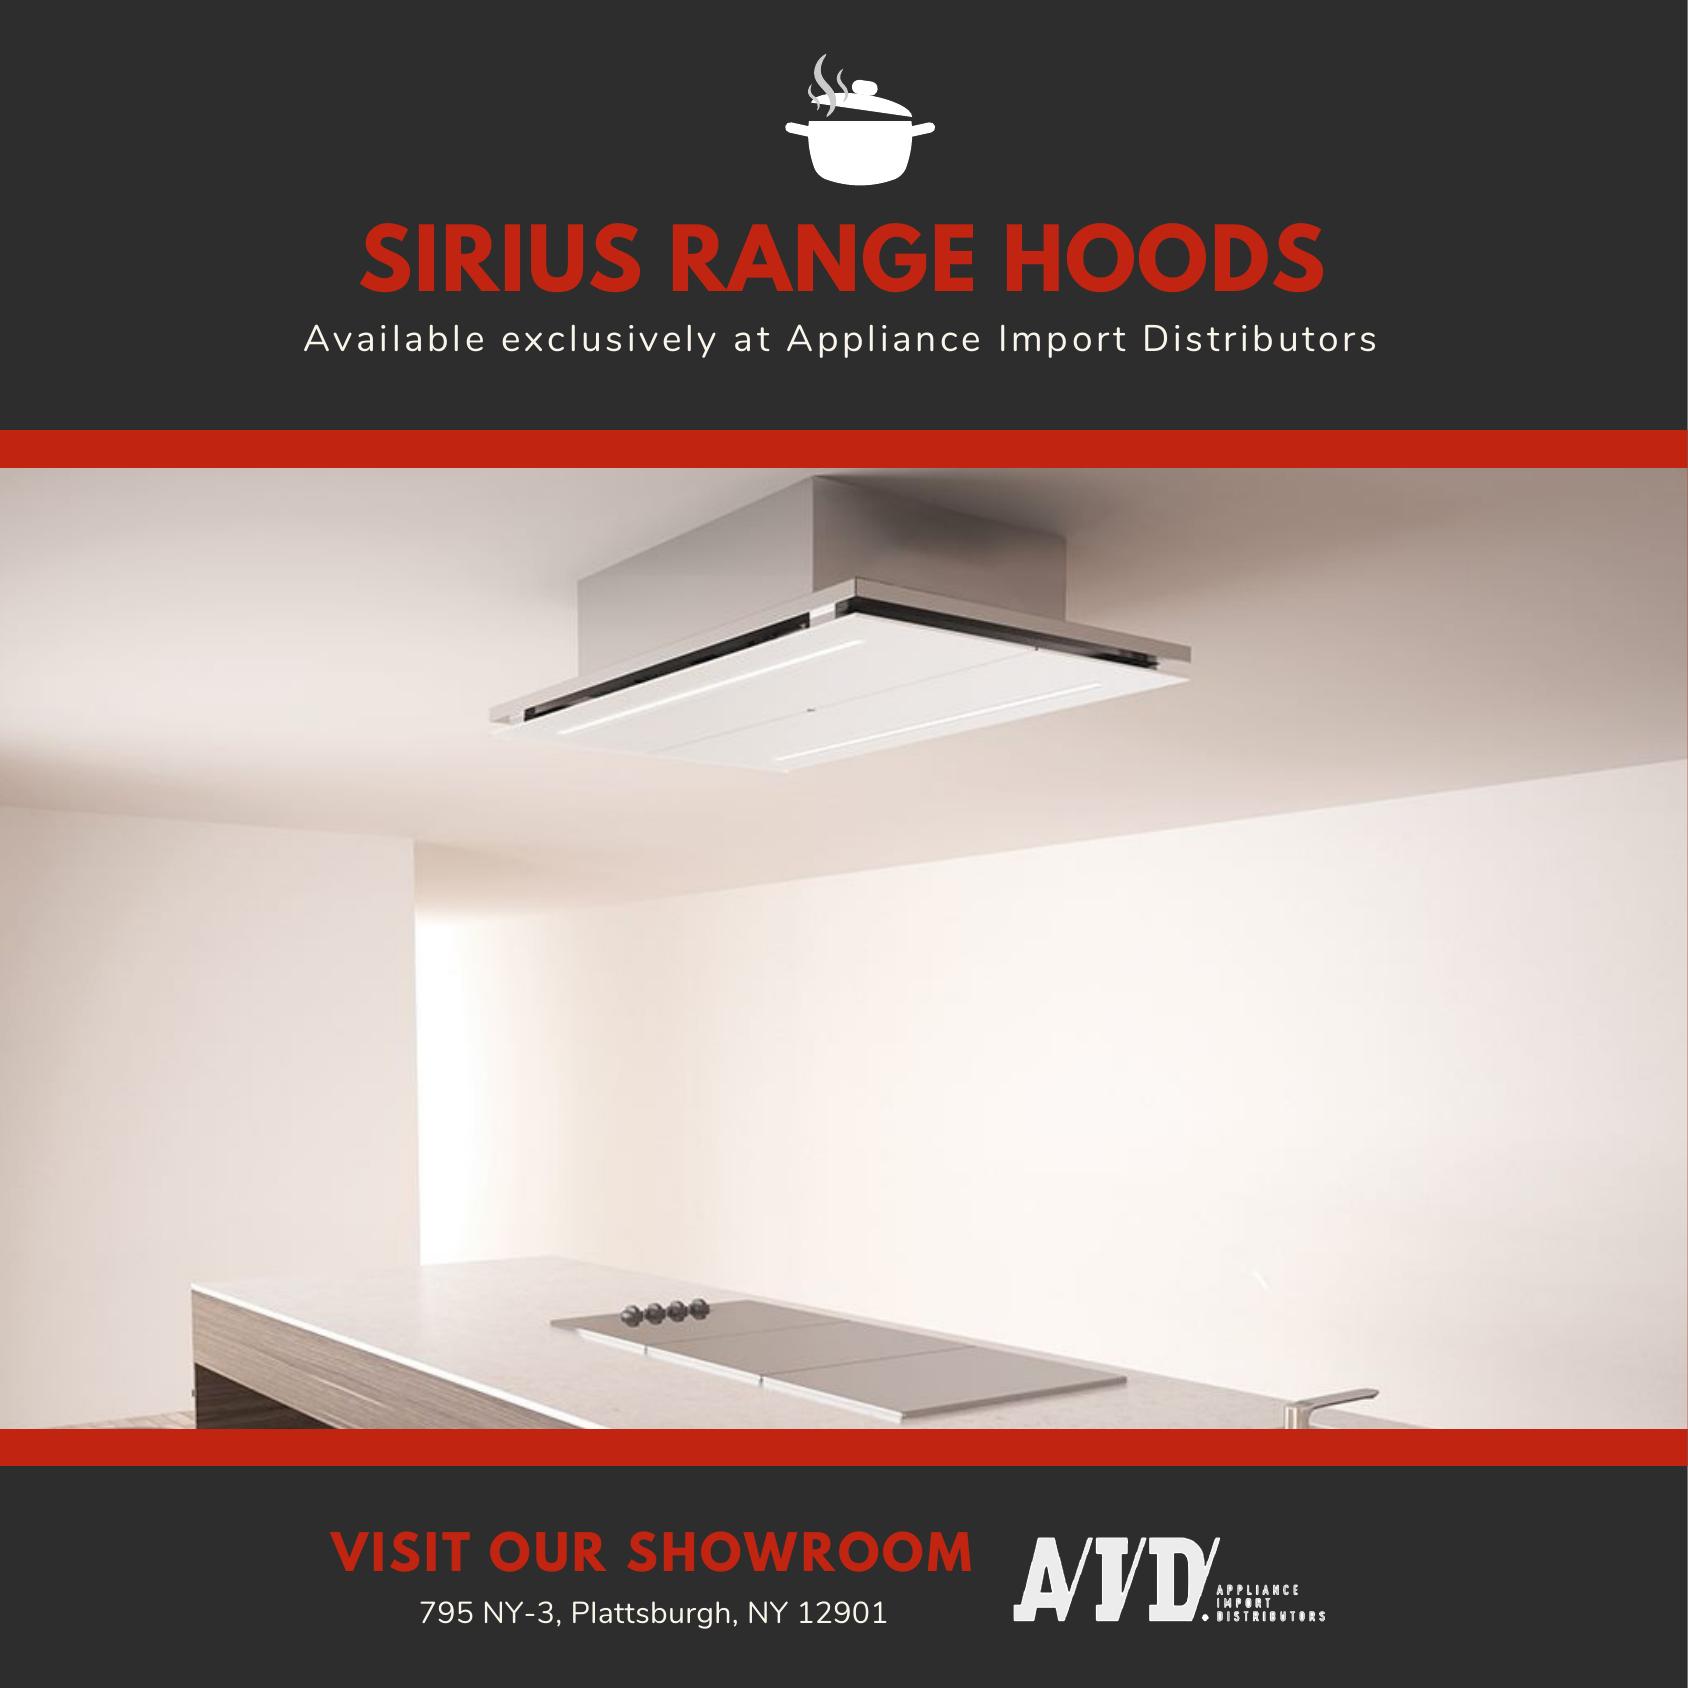 Sirius Rangehoods Are Designed By Award Winning Engineers That